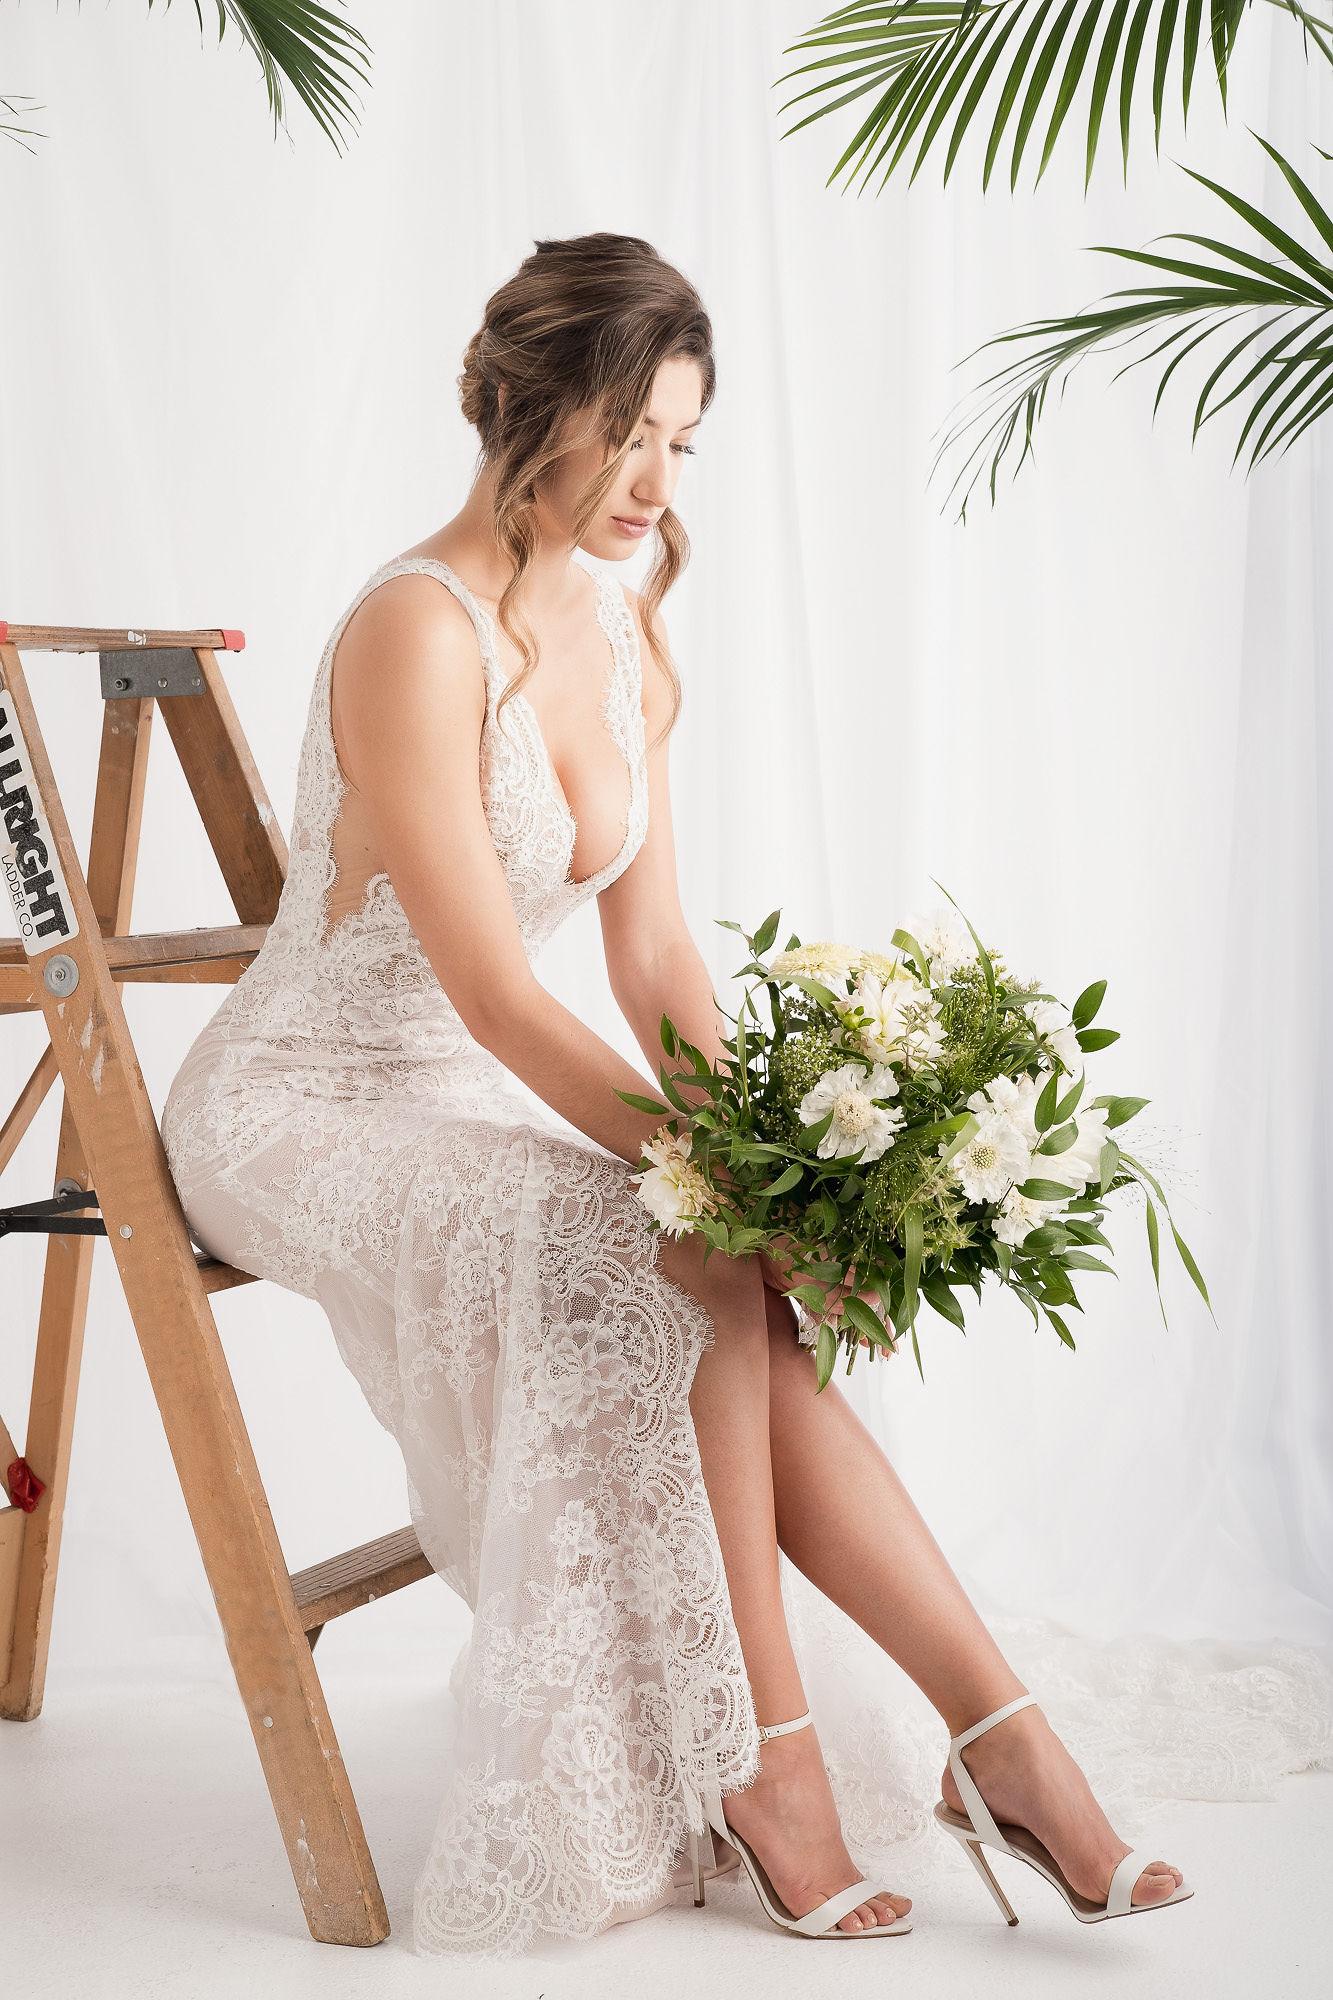 601_Wedding_Portfolio_20190721-Modifier.jpg